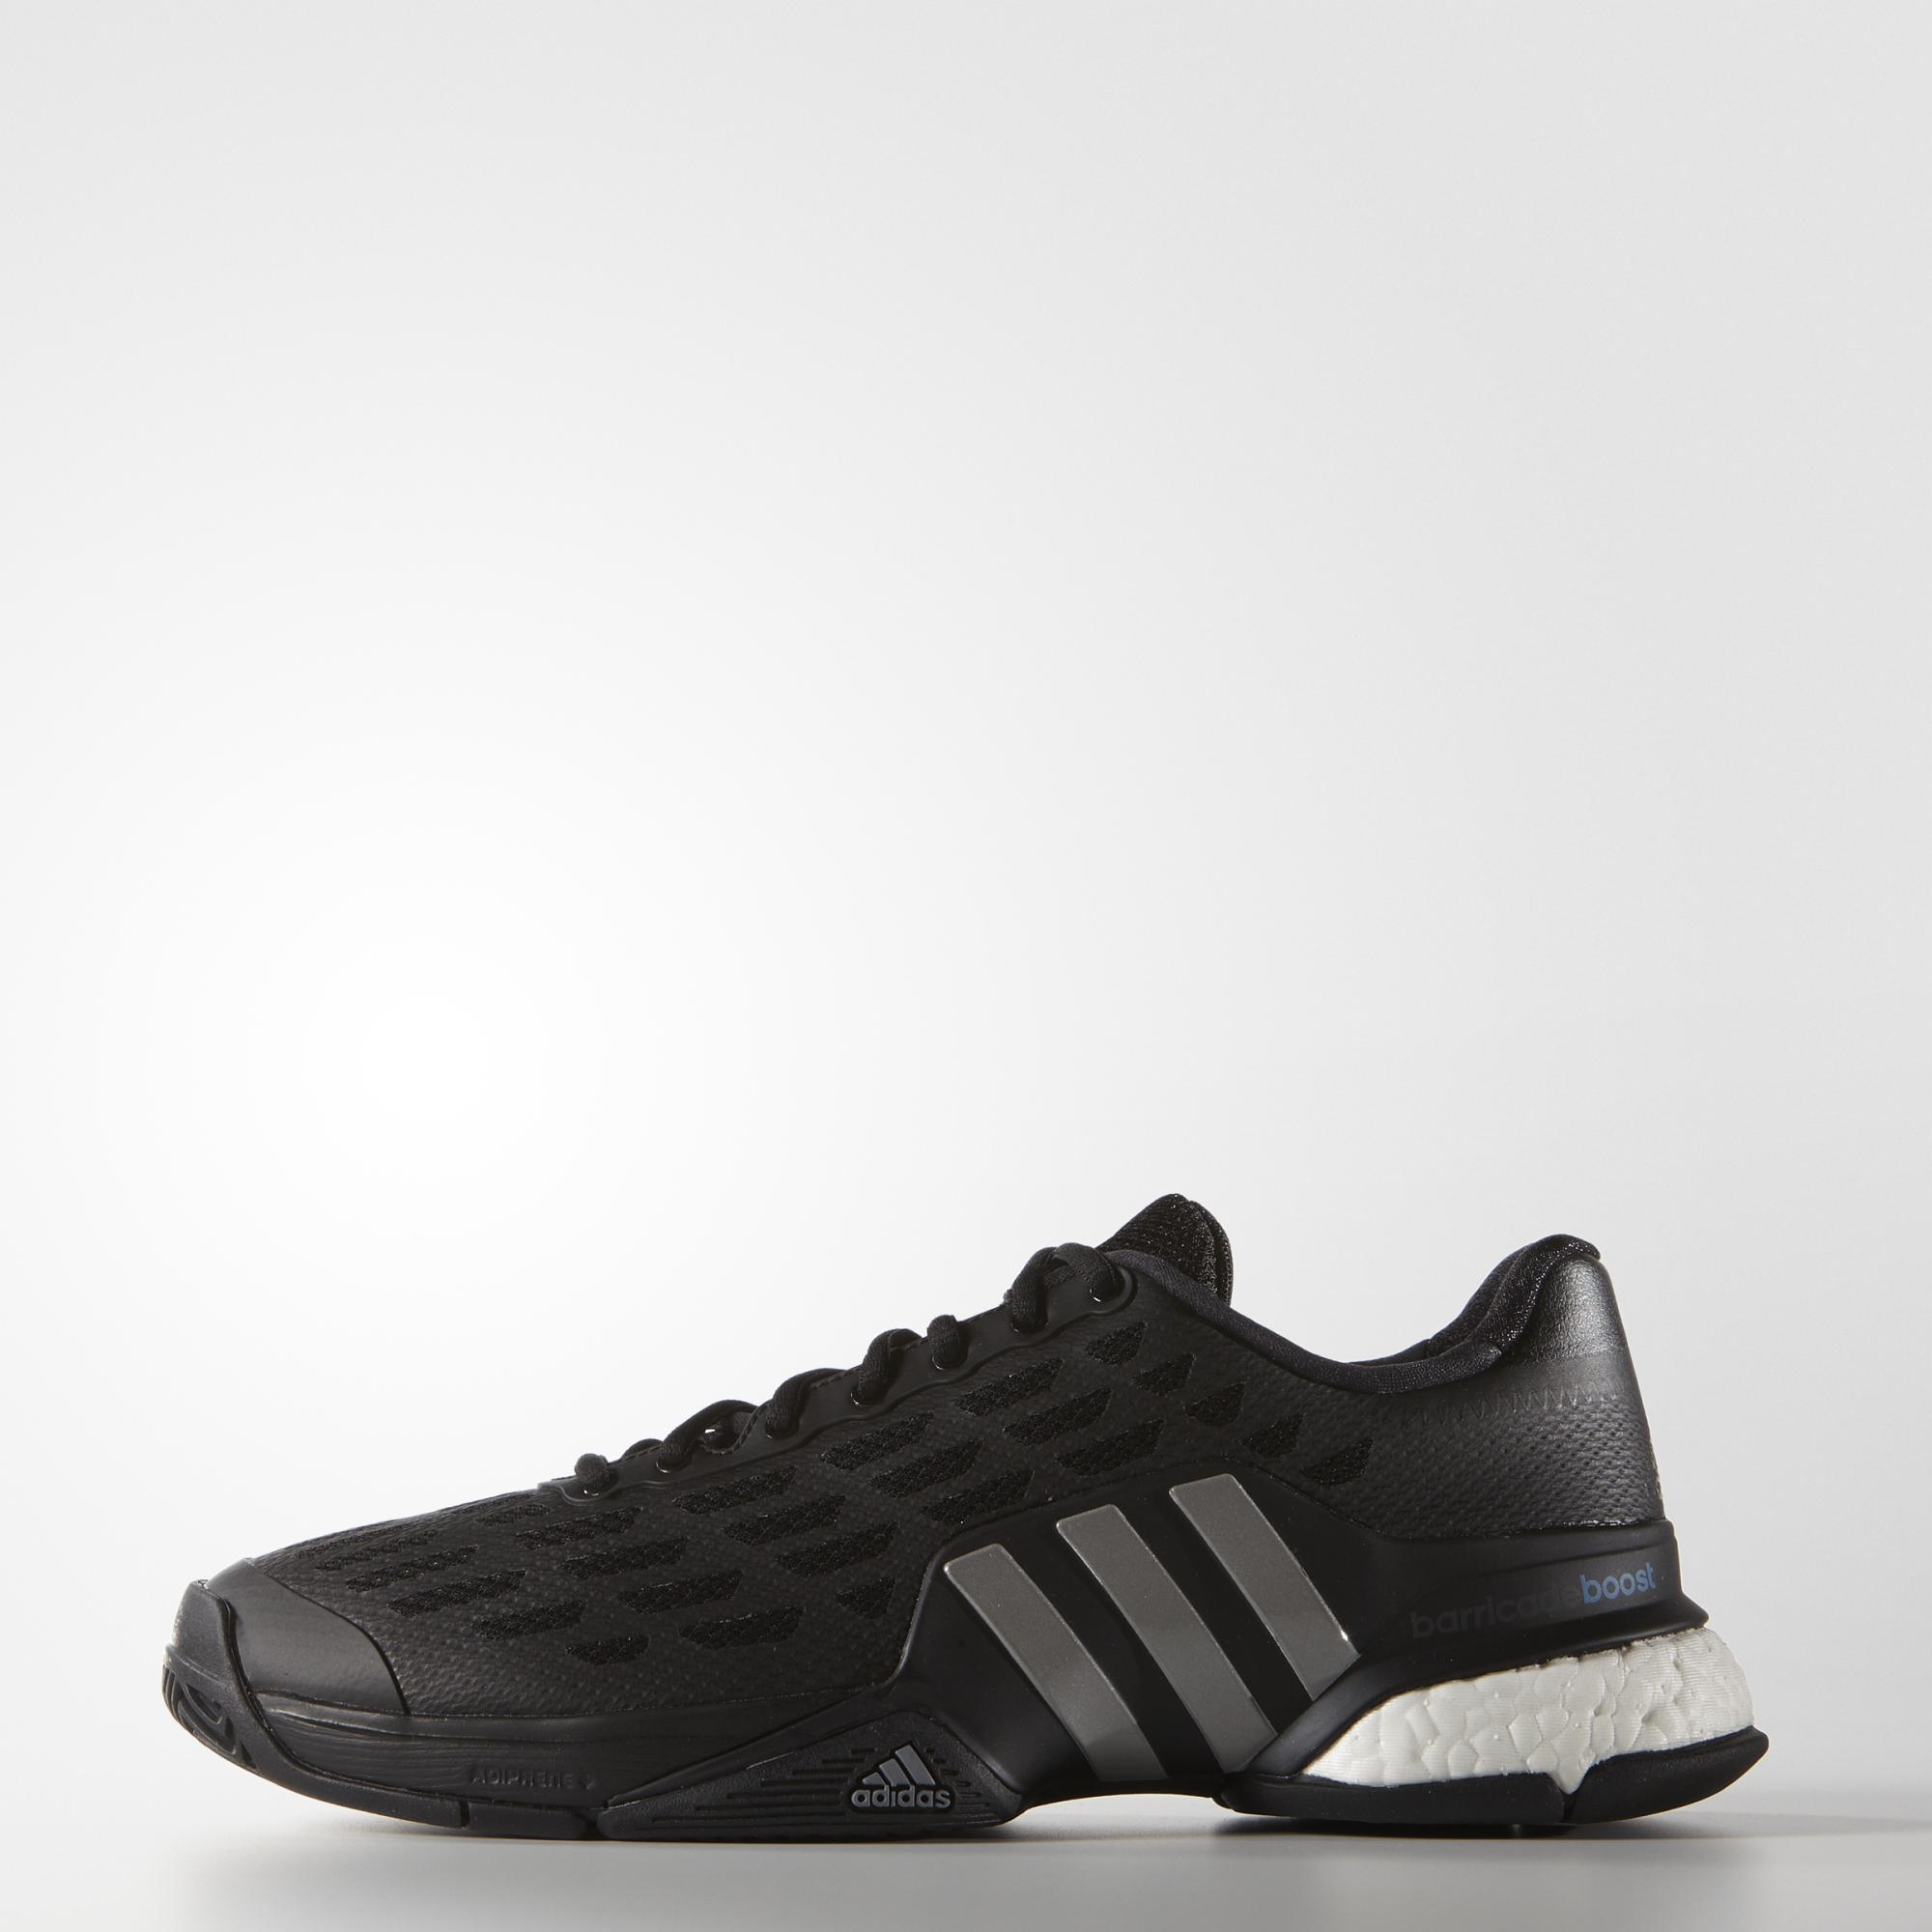 online retailer 711ca 1dd21 Adidas Mens Barricade Boost 2016 Tennis Shoes - Black - Tennisnuts.com